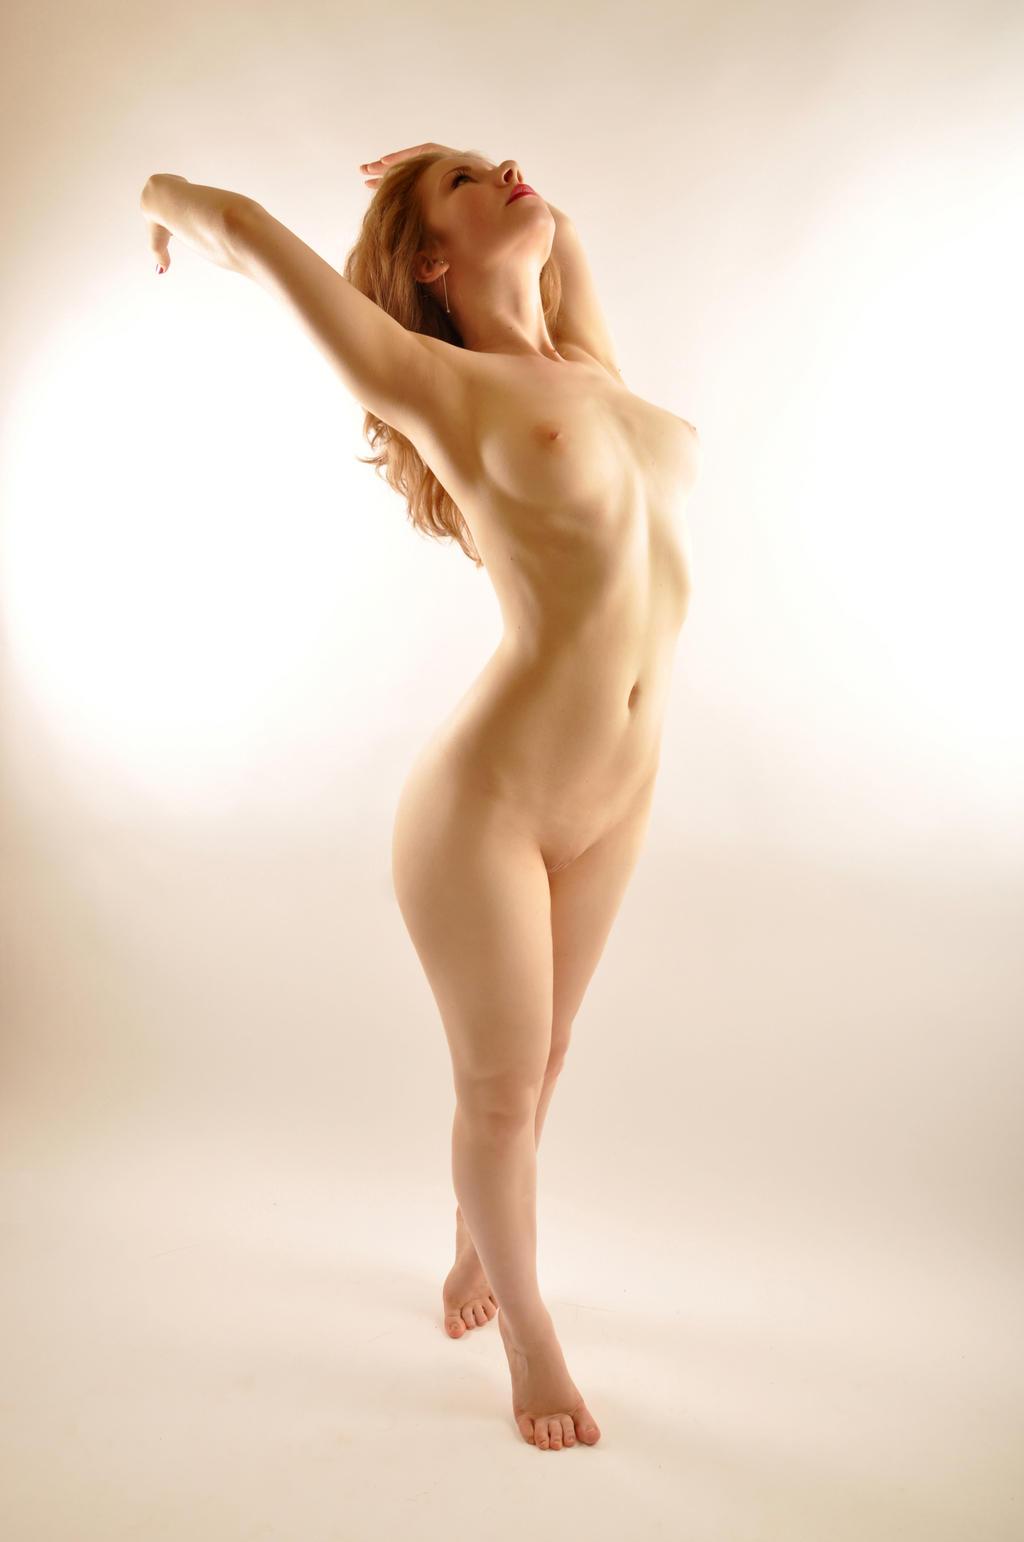 Nude Single Female On Daposes - Deviantart-4903